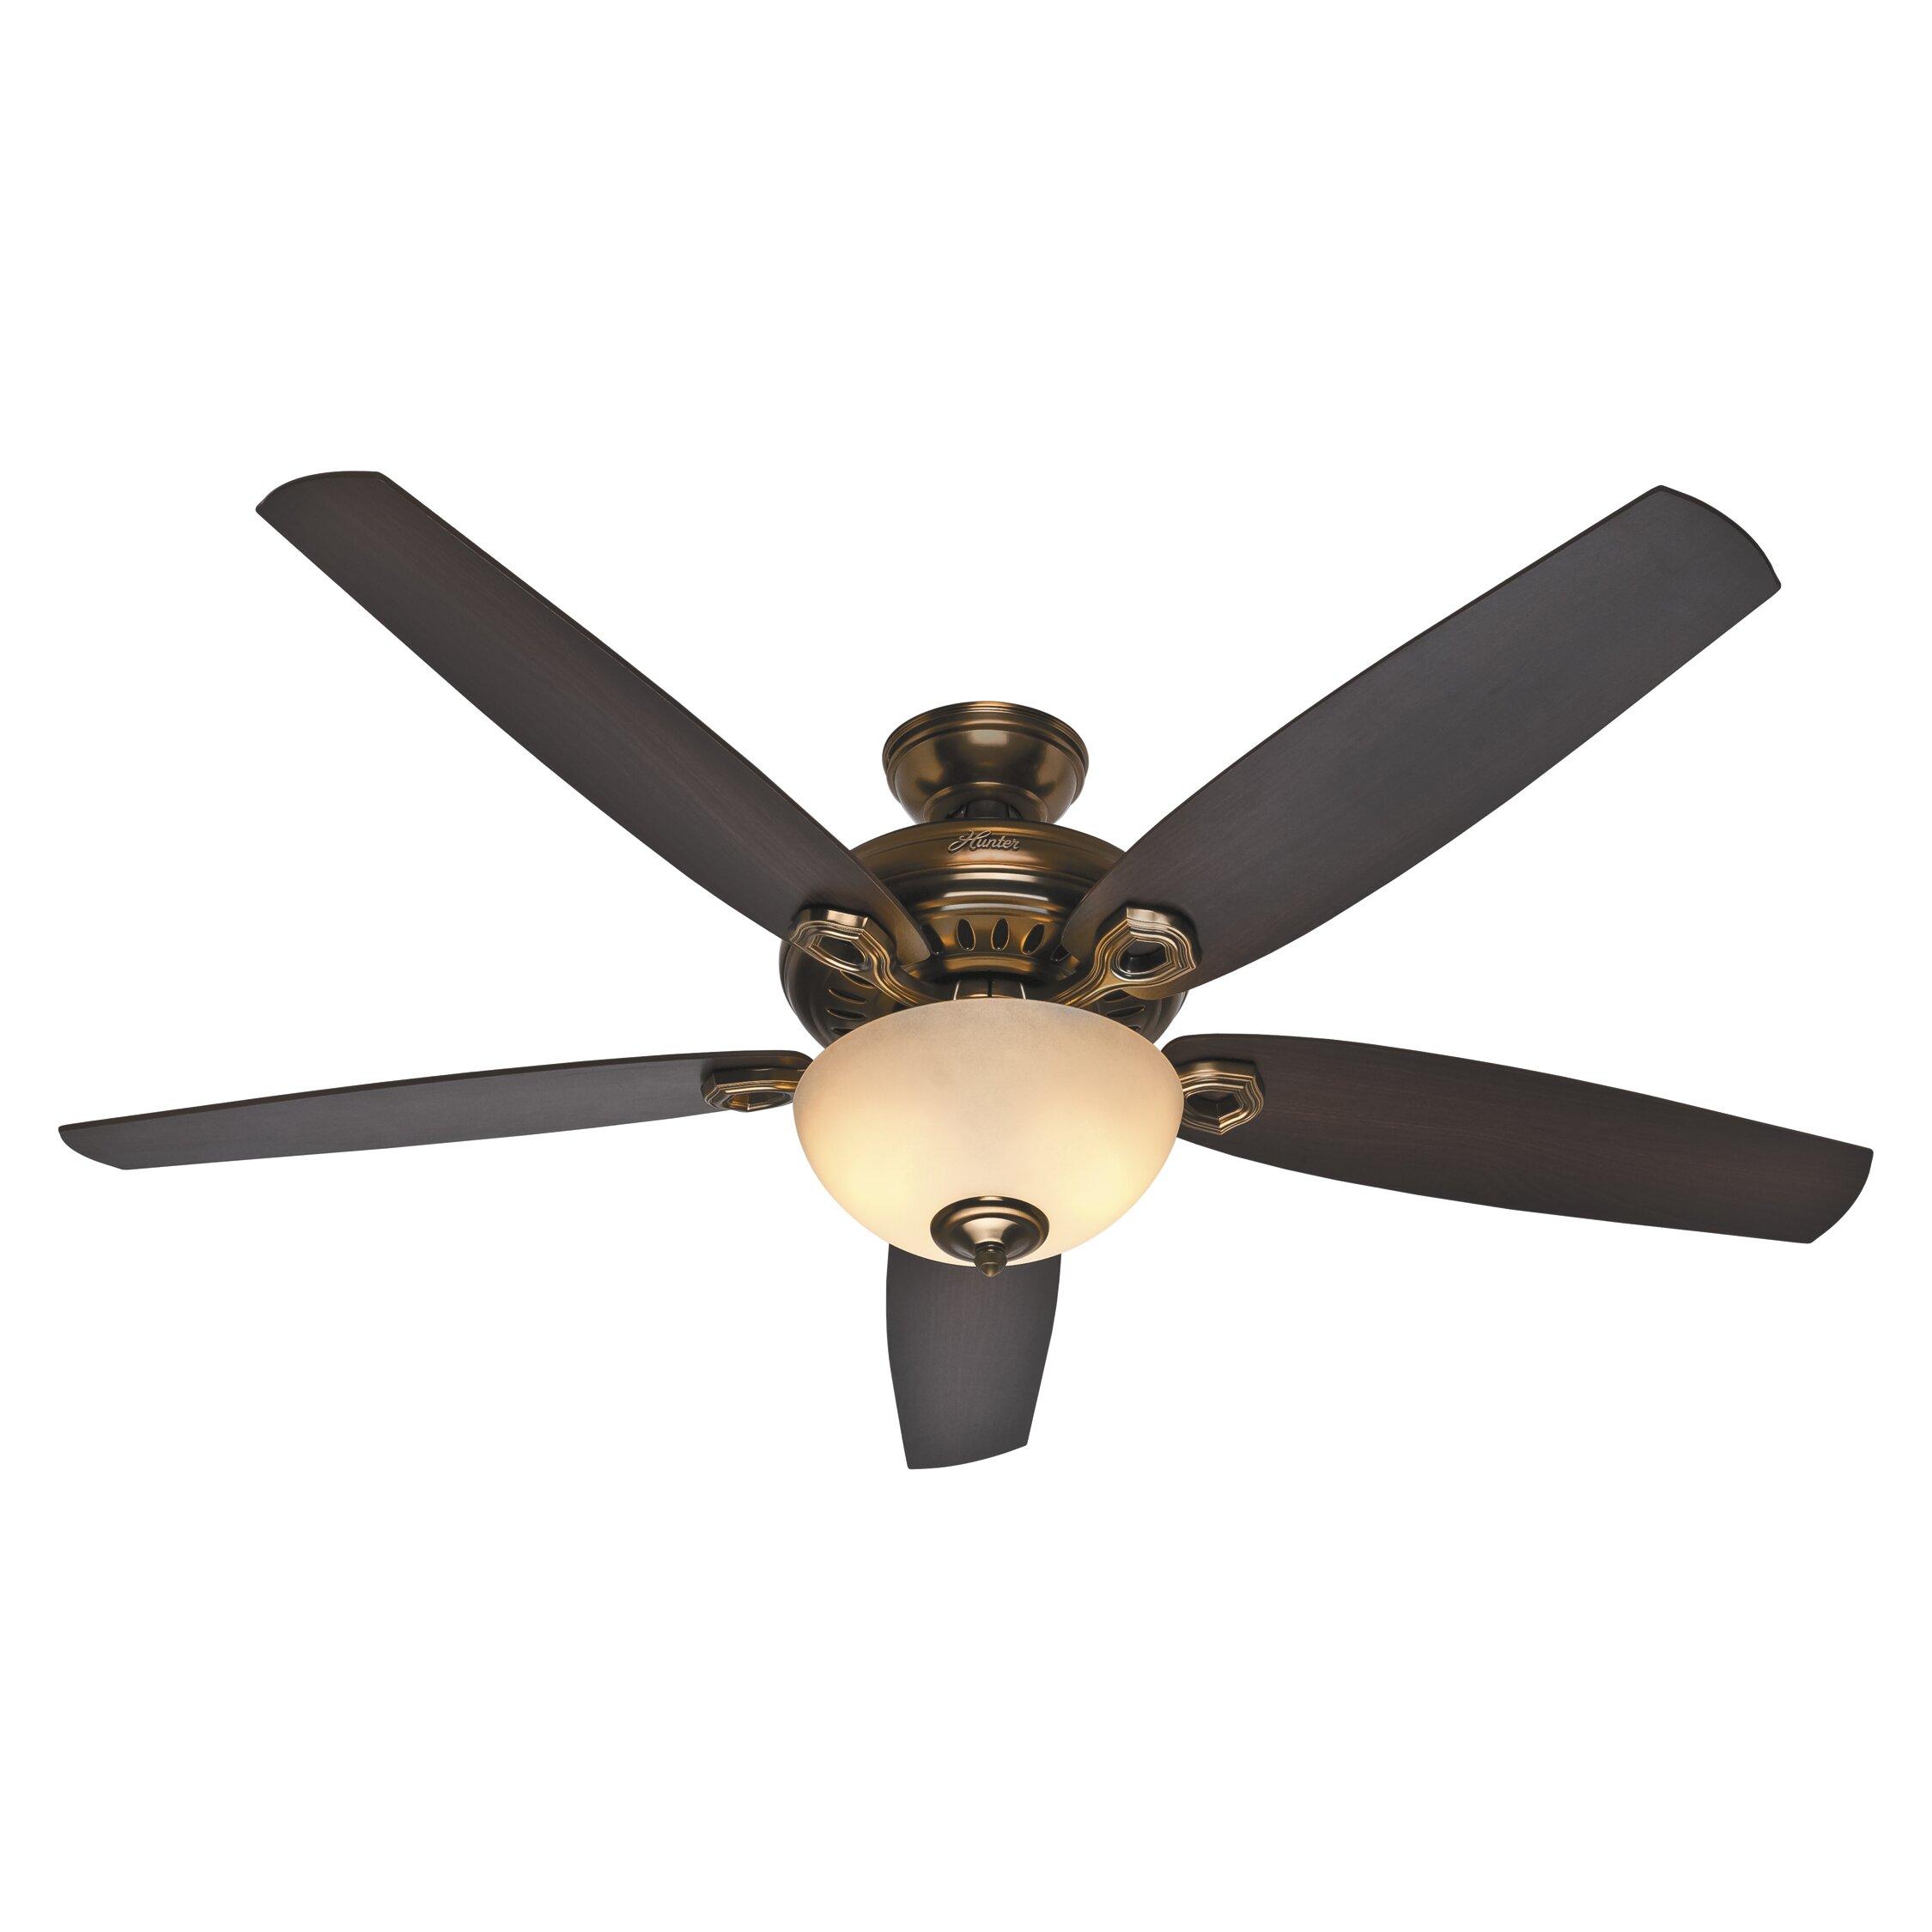 "Hunter Capshaw 60 Premier Bronze Ceiling Fan With Light: 60"" Valerian 5 Blade Ceiling Fan"